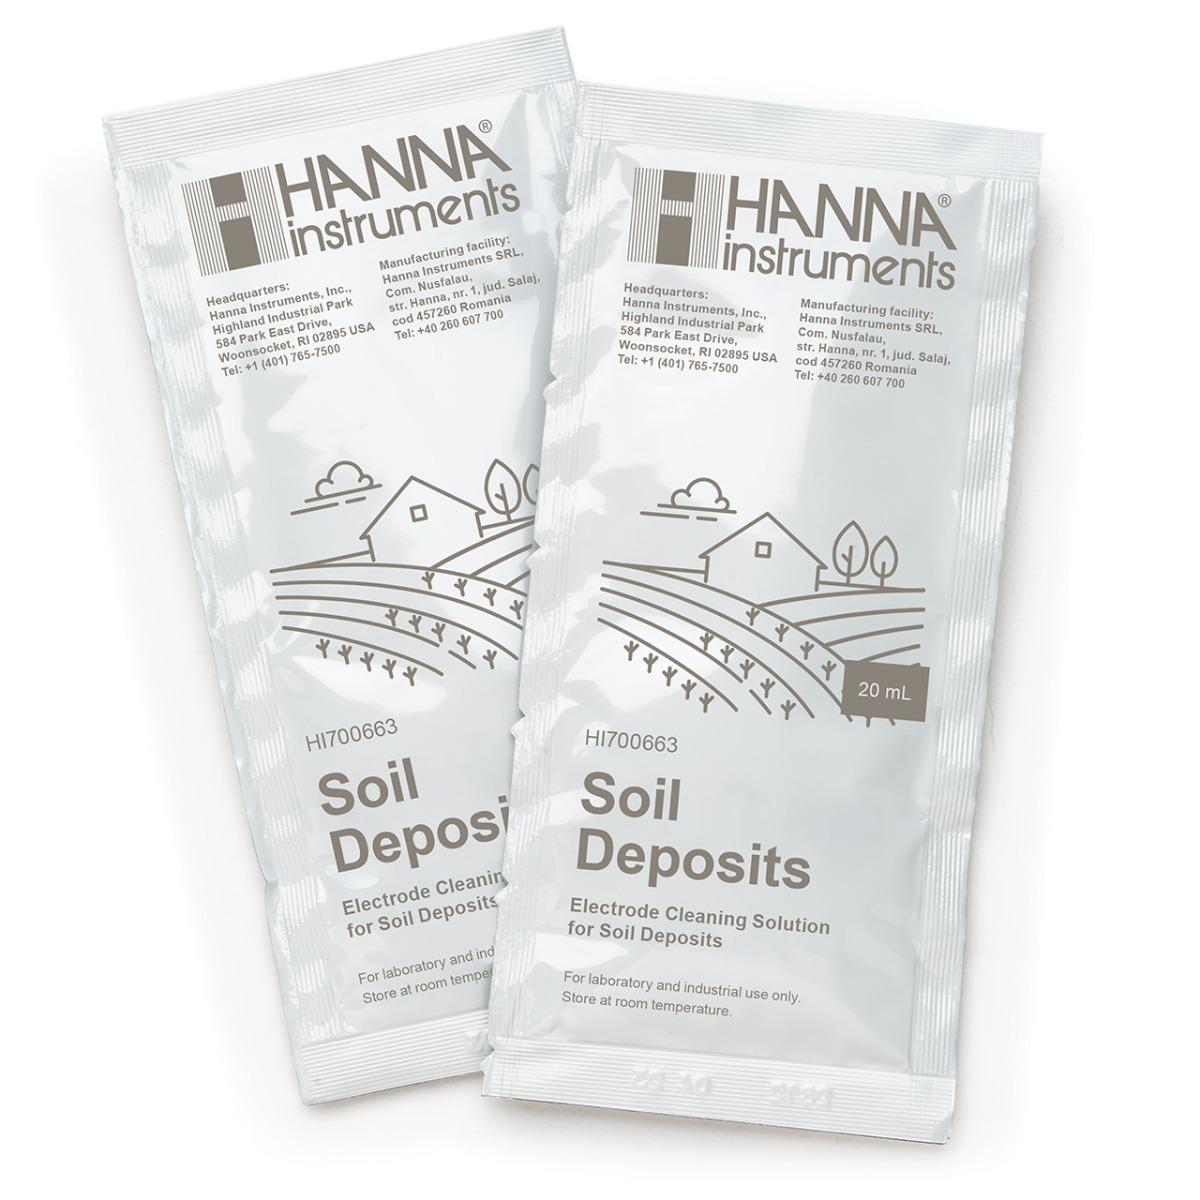 HI700663P Cleaning Solution for Soil Deposits (25 x 20 mL Sachets)